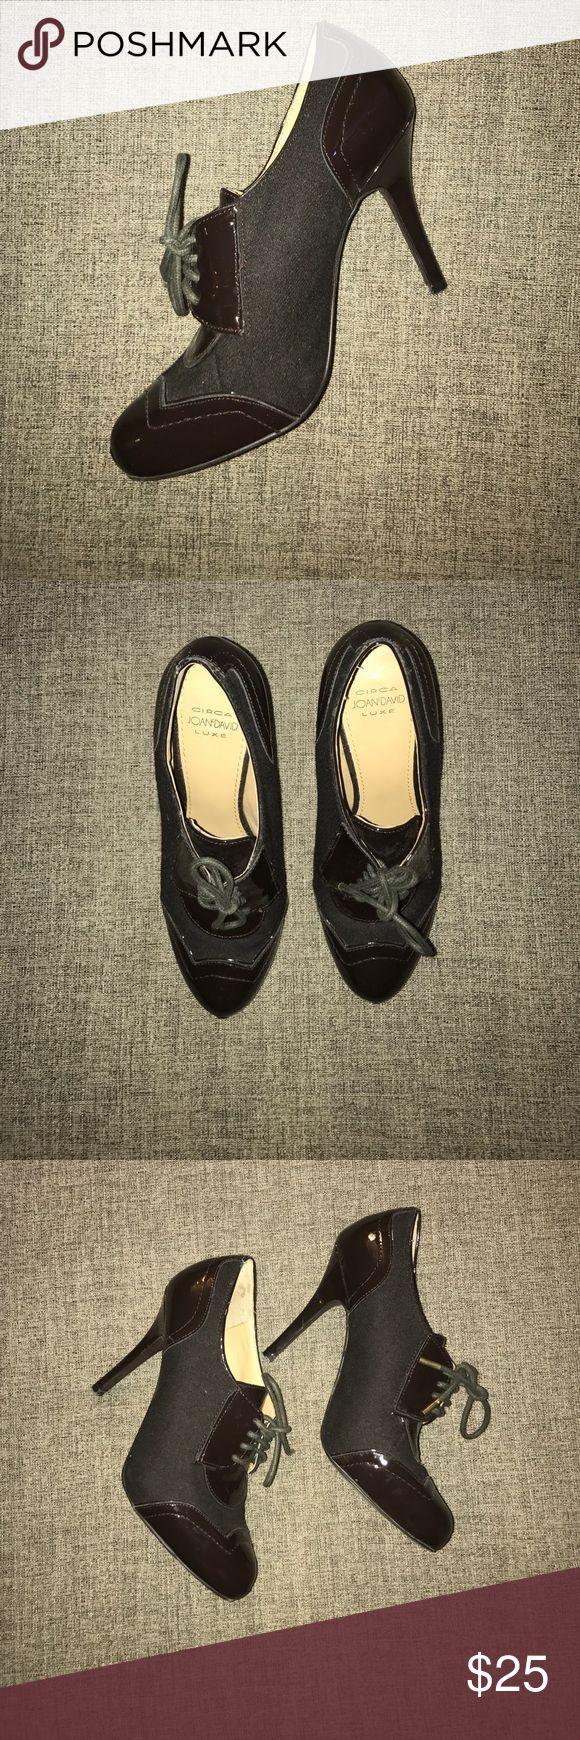 Joan & David sz 6 brown oxford Circa Joan & David Luxe sz 6 brown oxford. See pictures for wear. Joan & David Shoes Heels